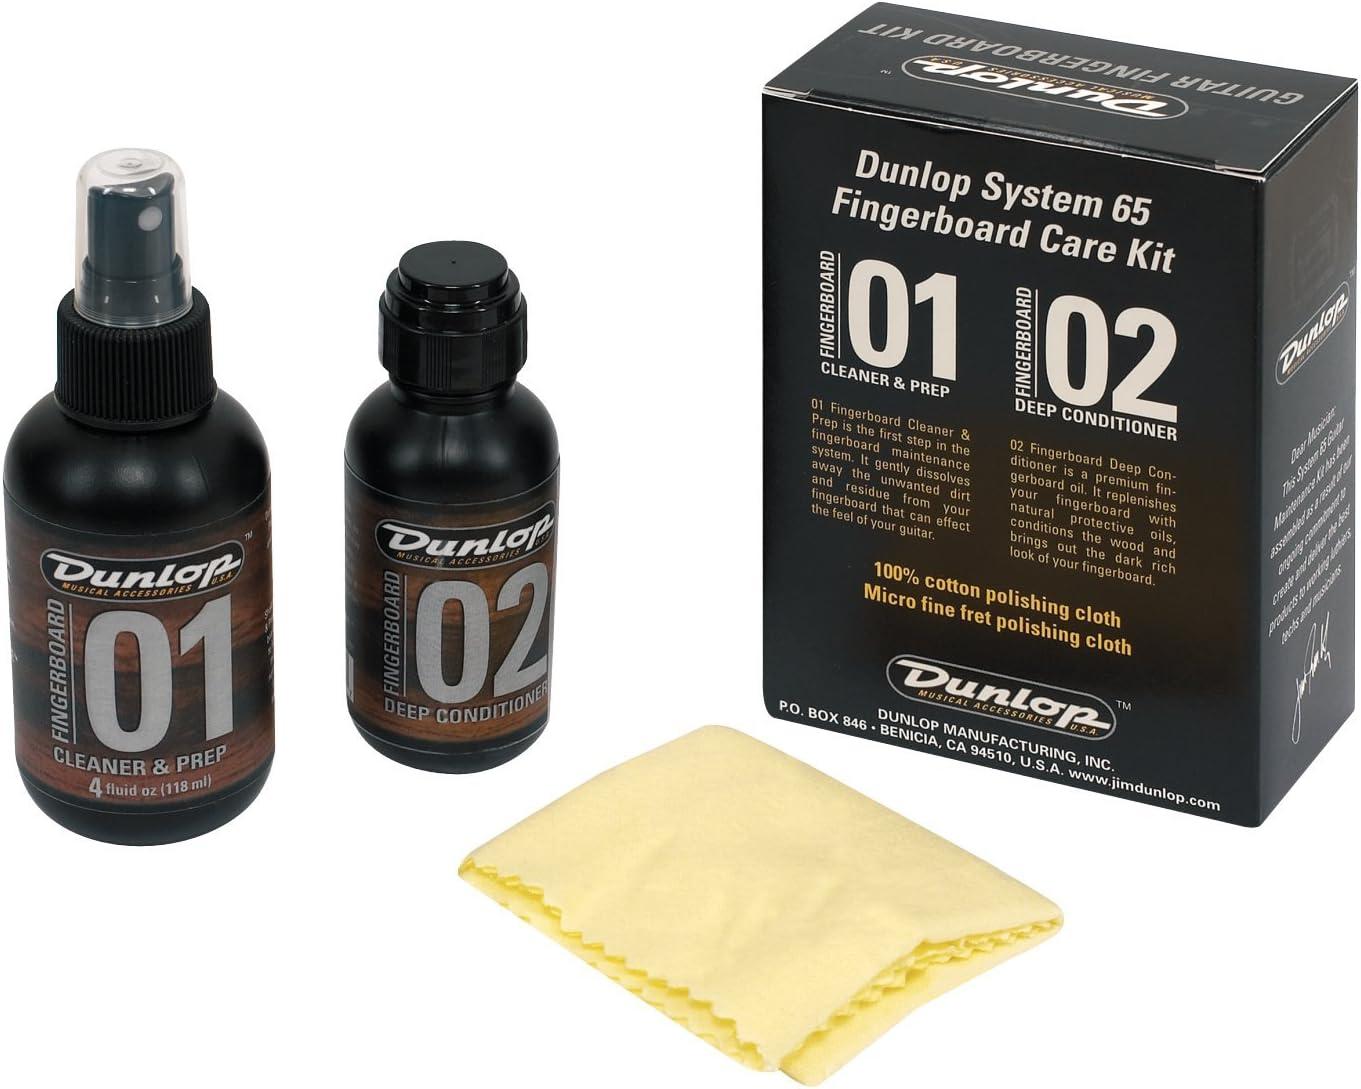 Jim Dunlop Diapasón Kit para el cuidado